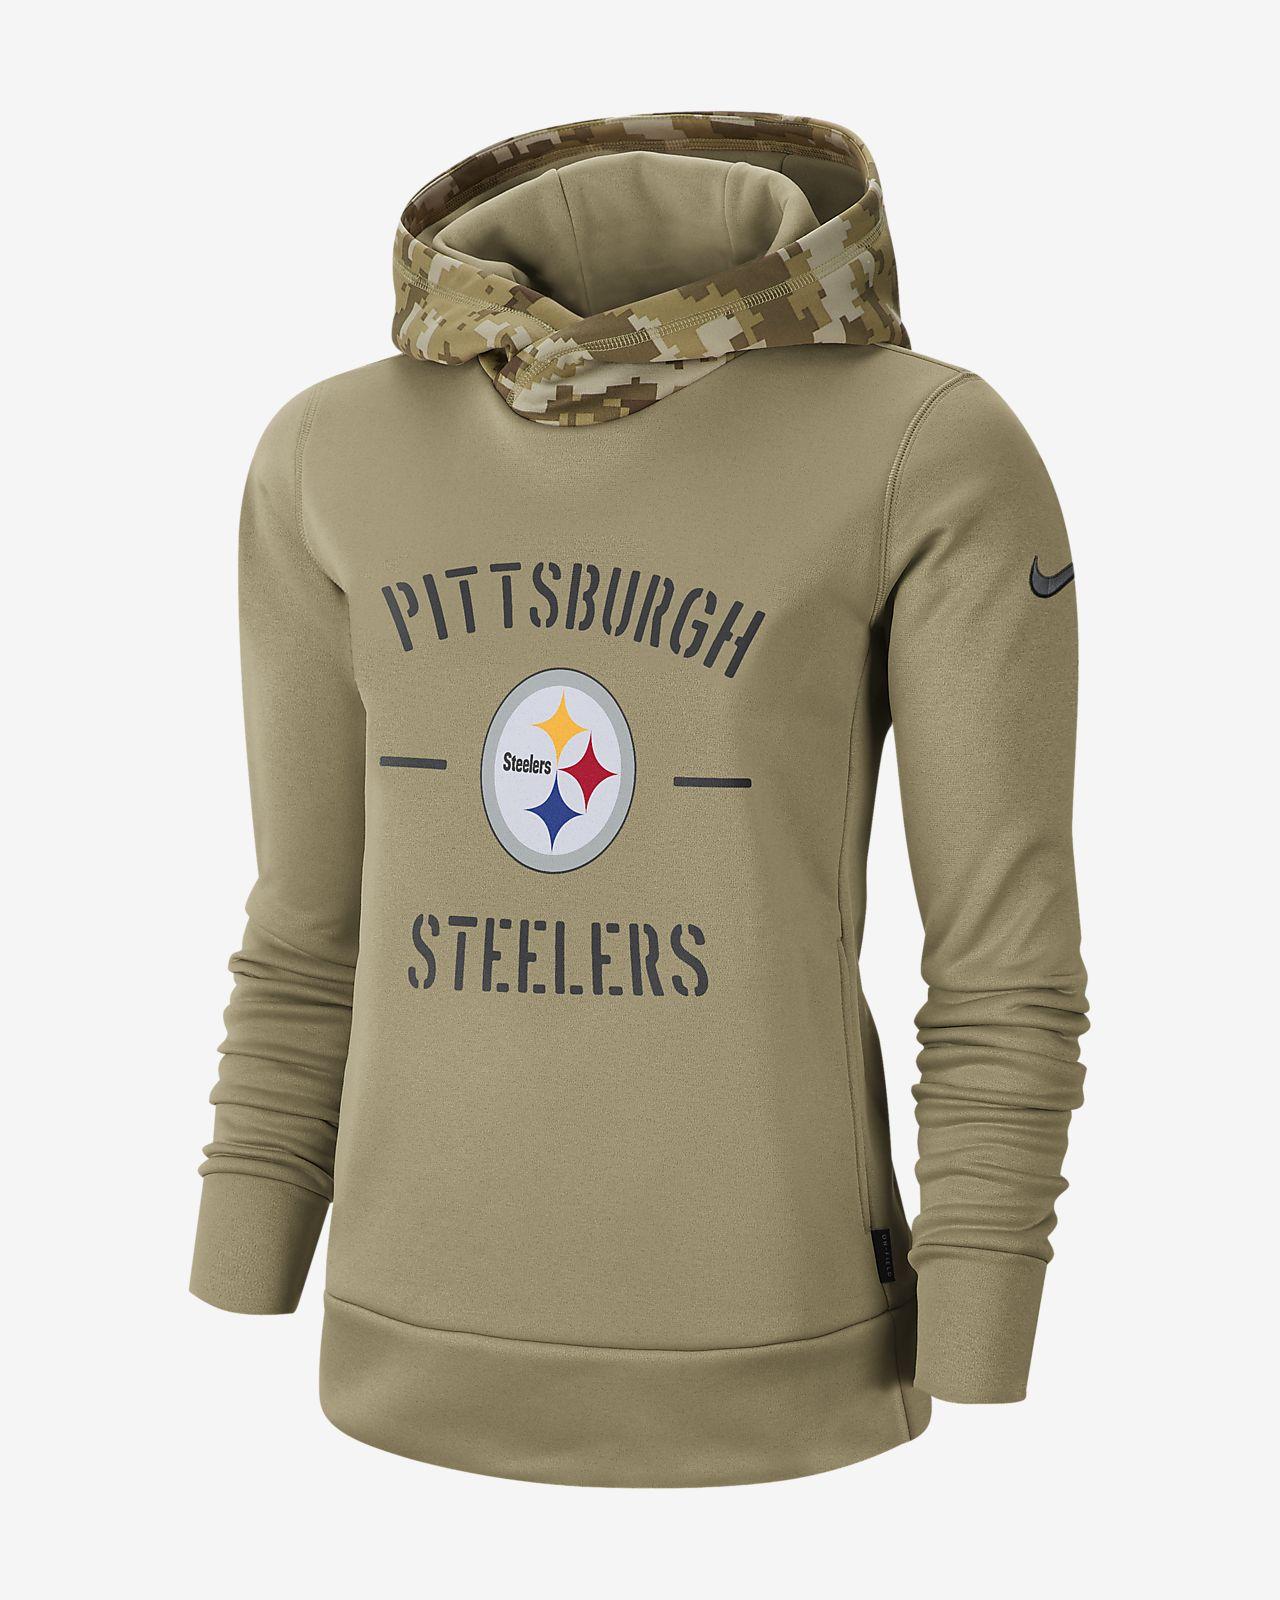 Nike Therma Salute to Service (NFL Steelers) Women's Hoodie